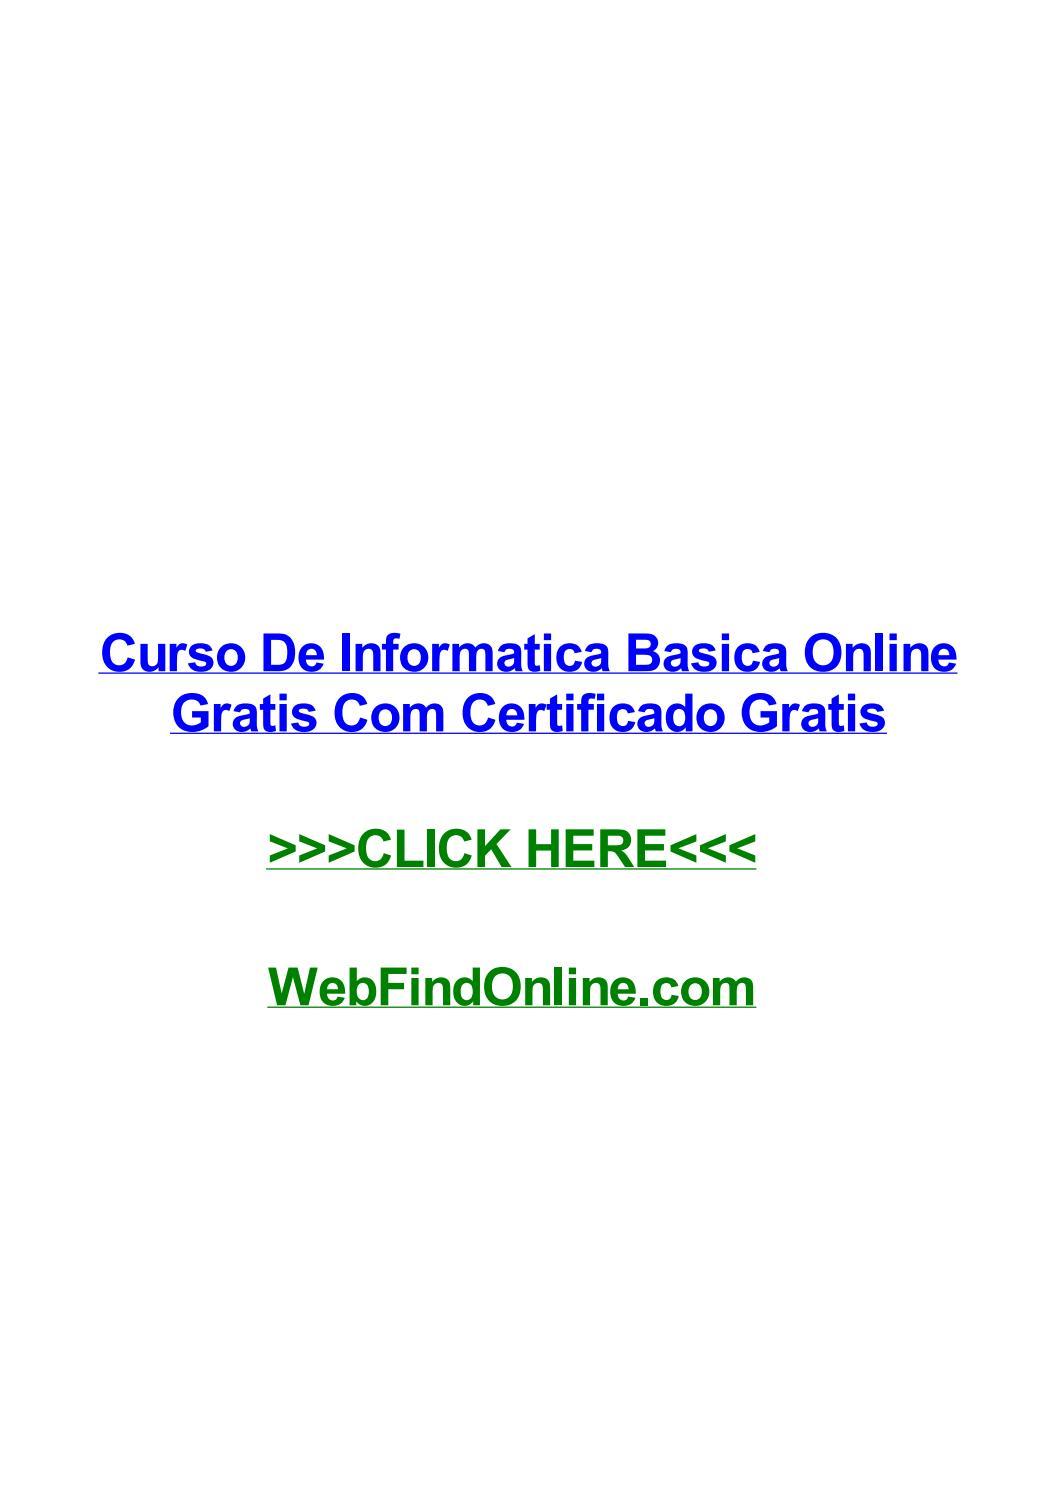 Curso De Informatica Basica Online Gratis Com Certificado Gratis By Biyajloow Issuu